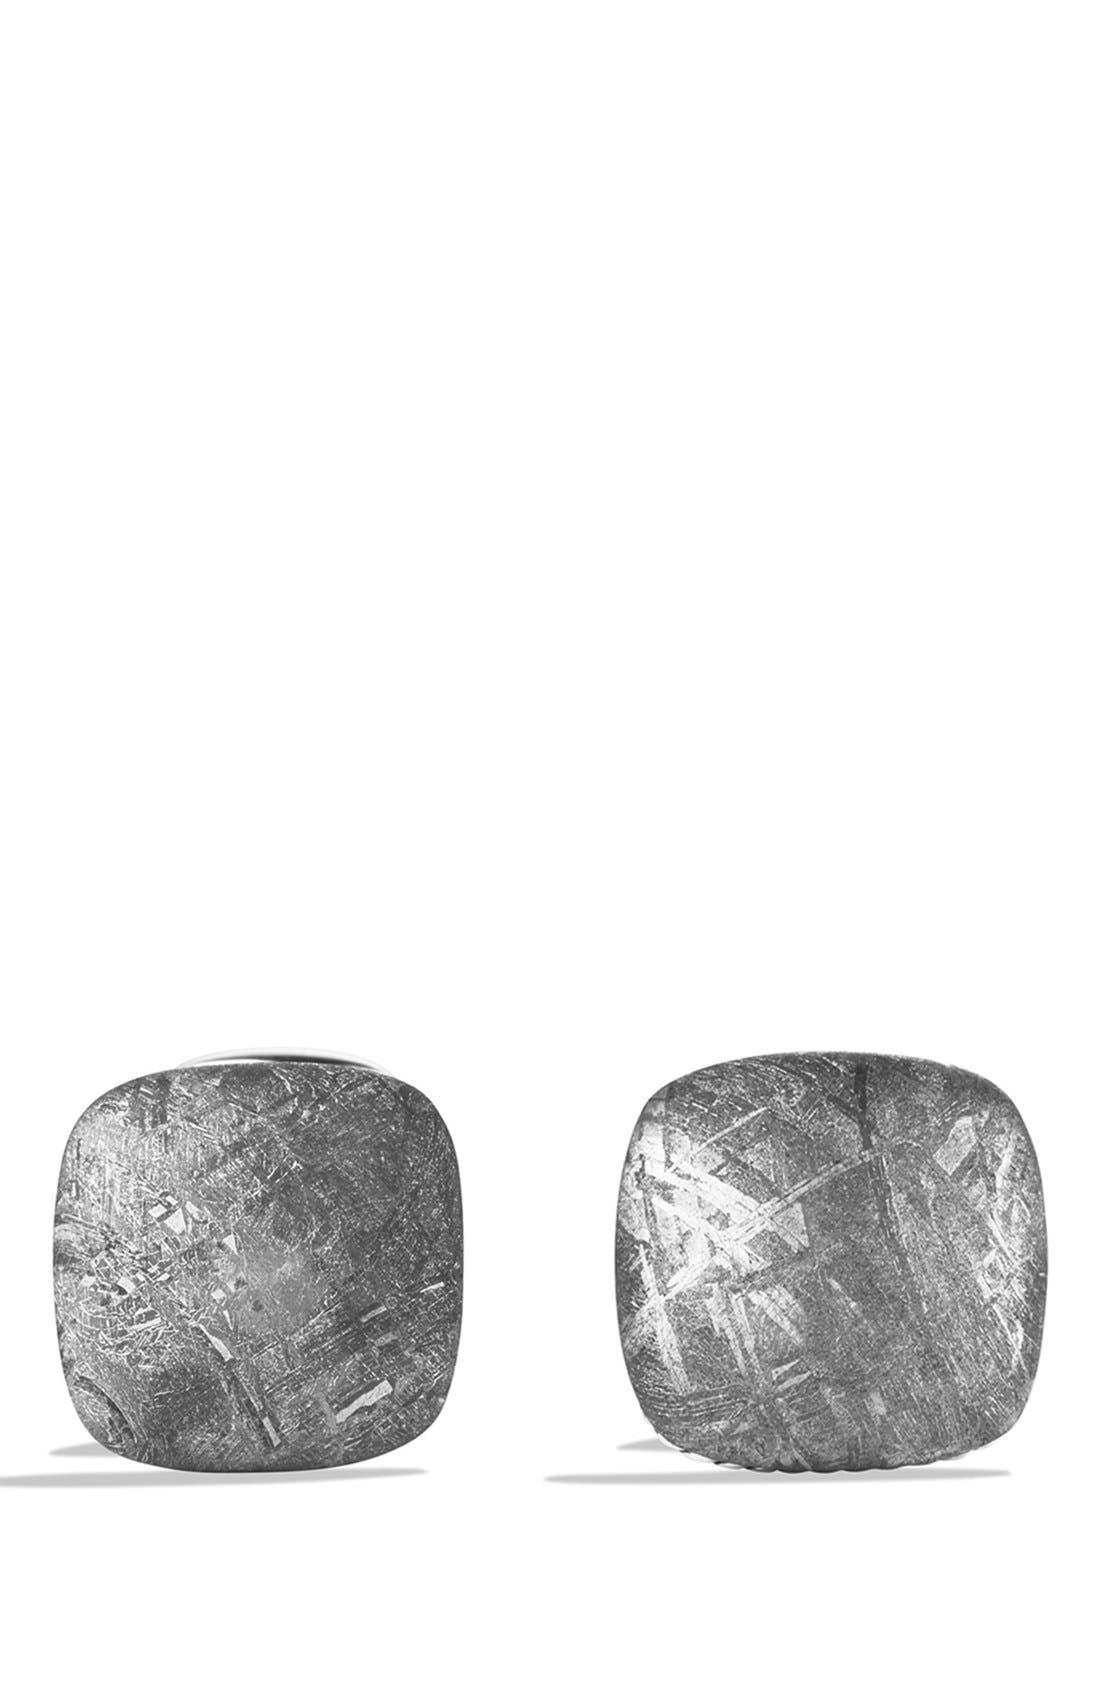 'Streamline' Cuff Links with Semiprecious Stone,                             Alternate thumbnail 2, color,                             Meteorite